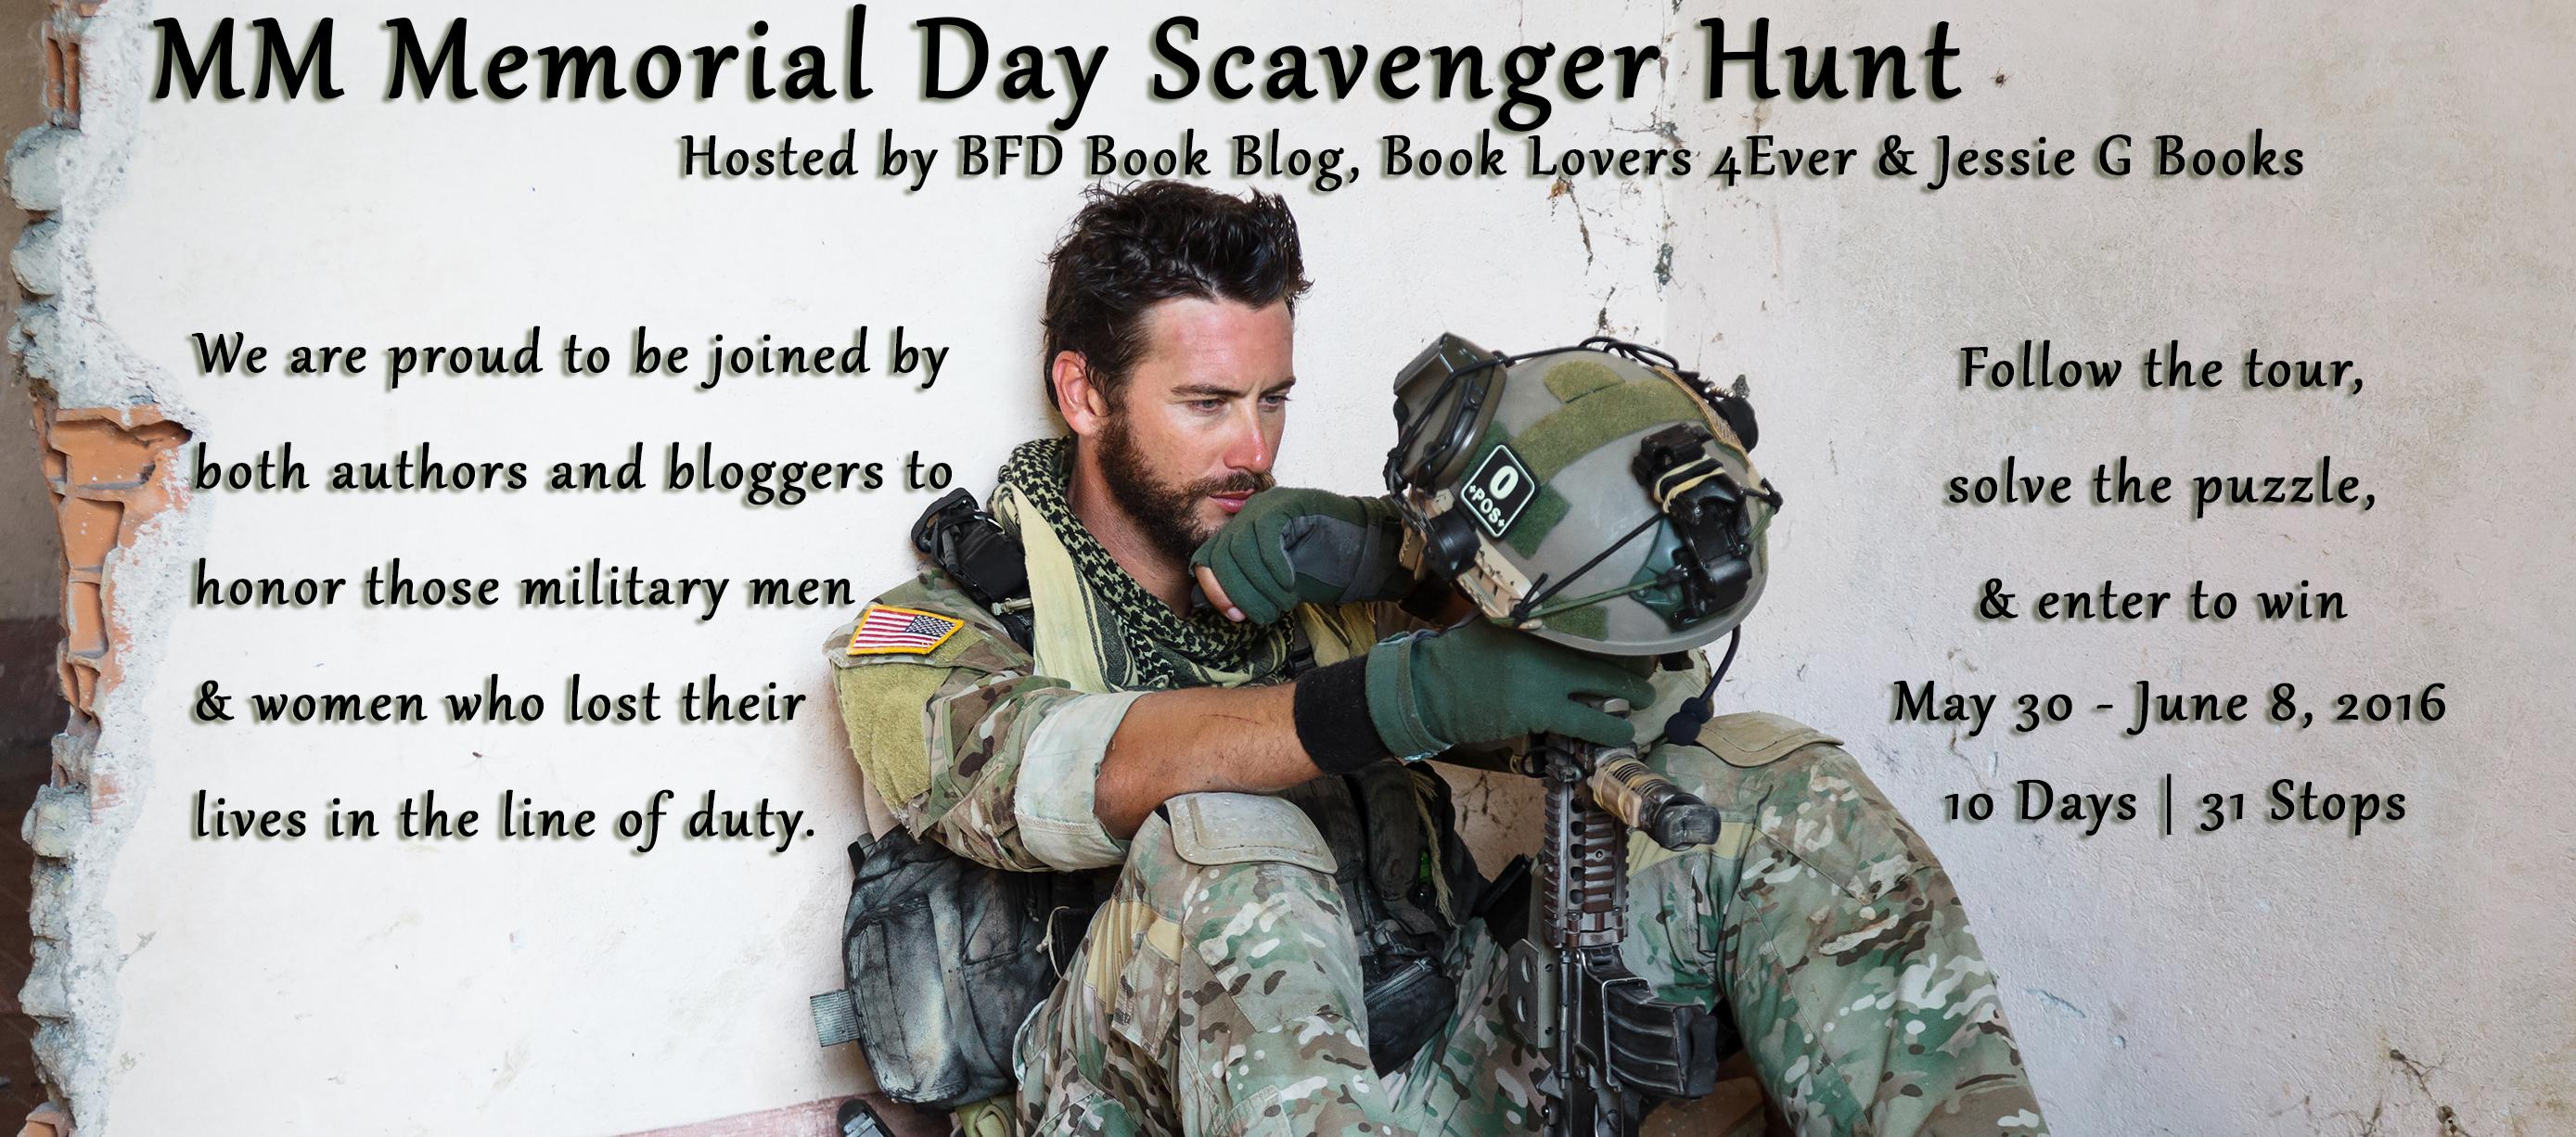 MM Memorial Day Scavenger Hunt